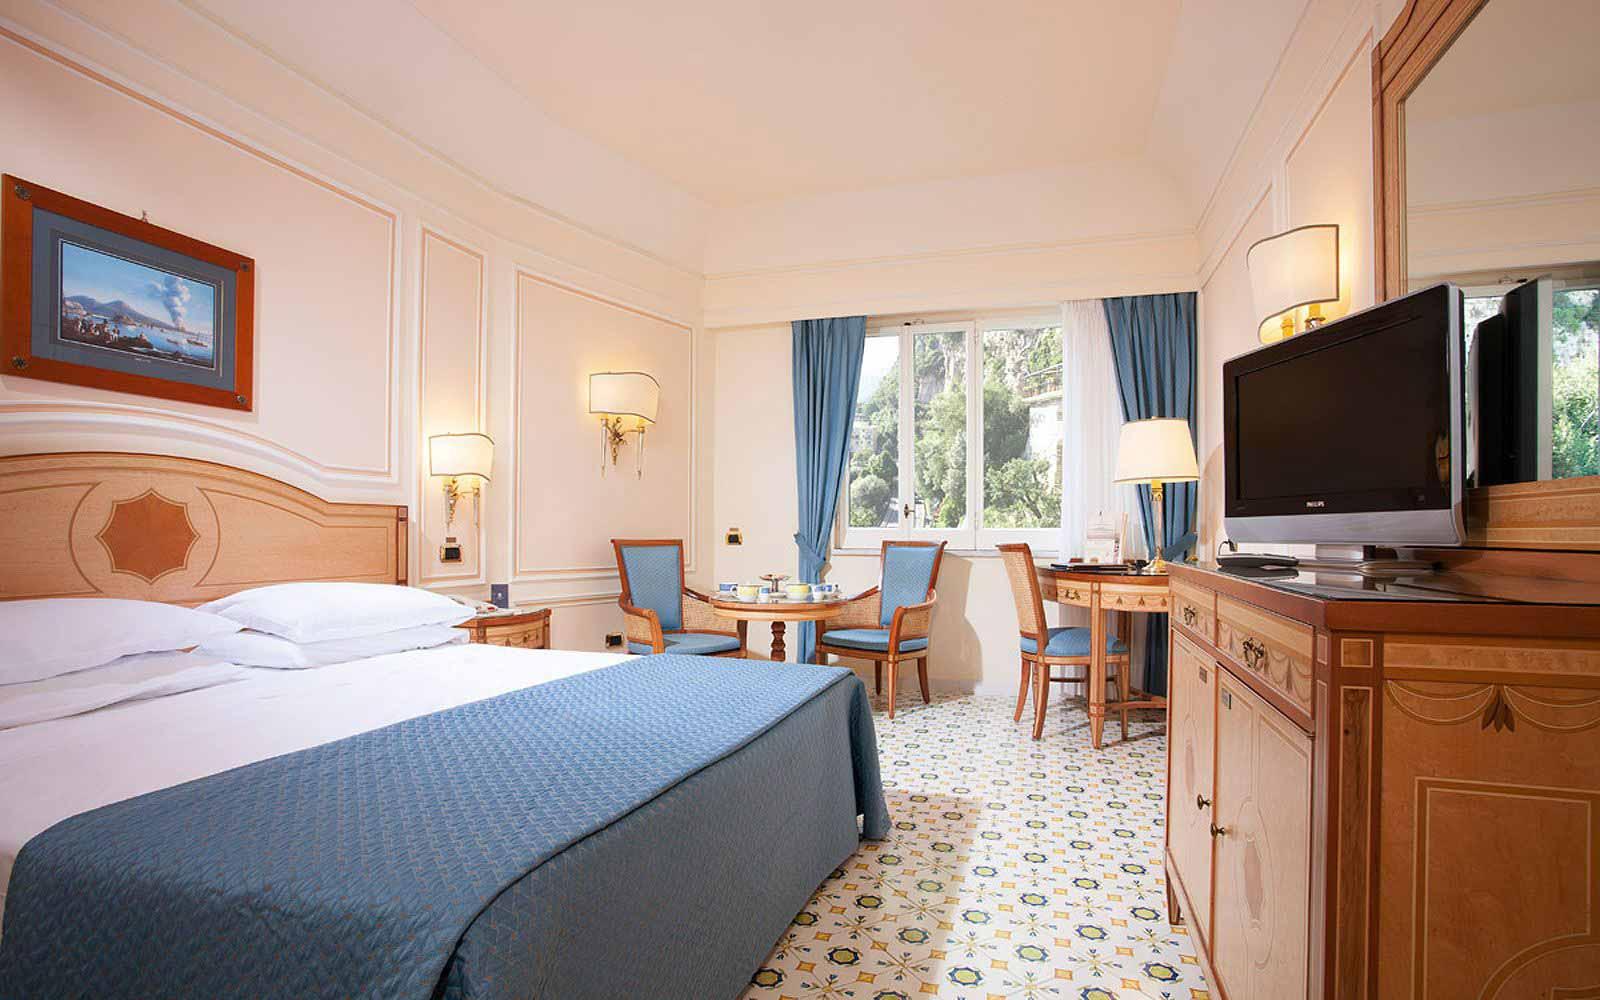 Standard Room at the Grand Hotel Capodimonte